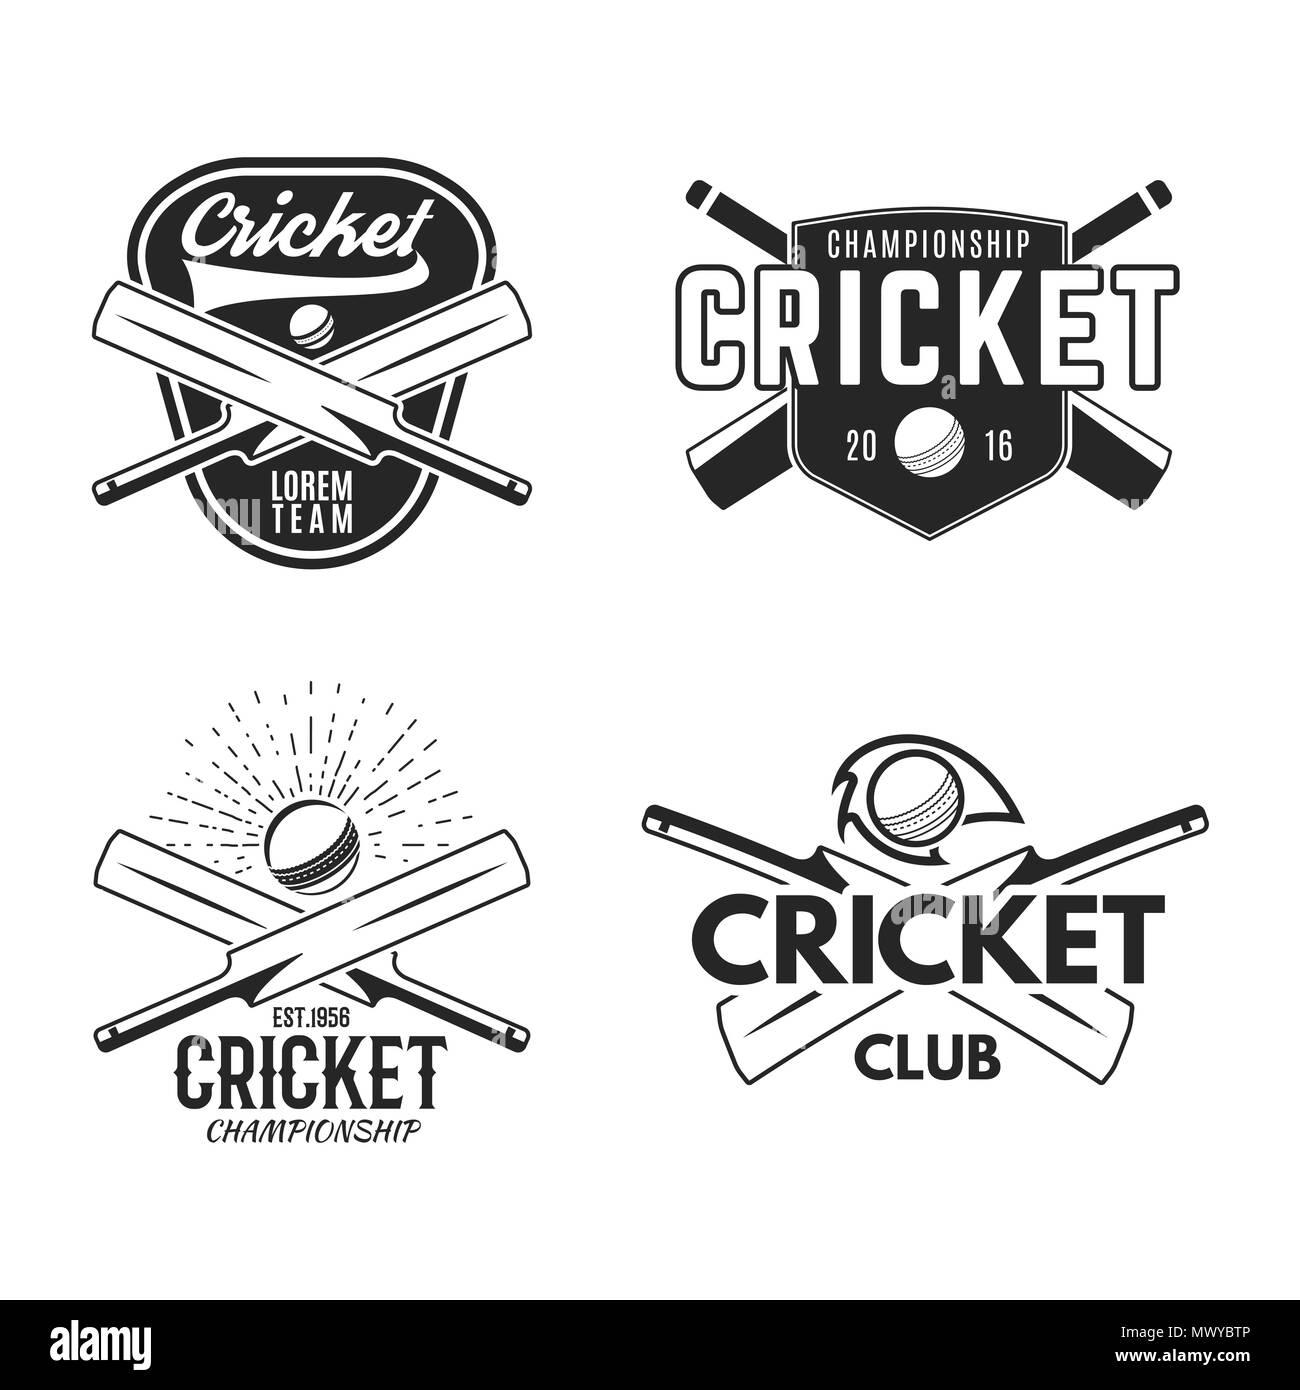 8f5924ba587 Cricket Ball Isolated On Black Background Stock Photos   Cricket ...